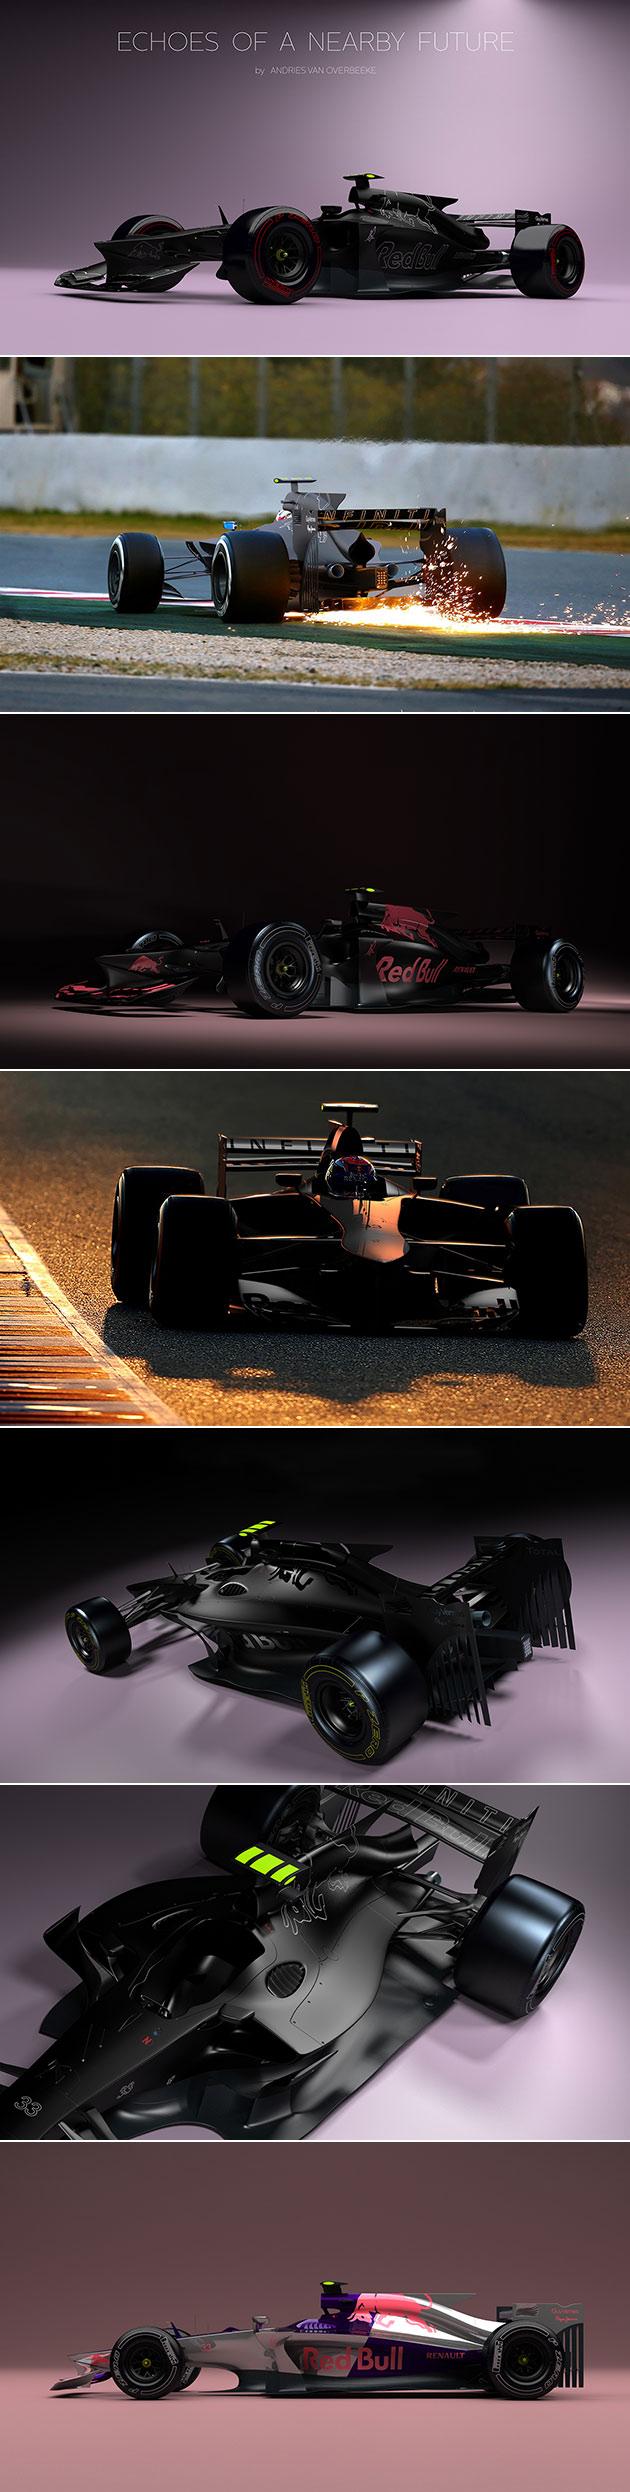 2010 Red Bull Formula 1 Car